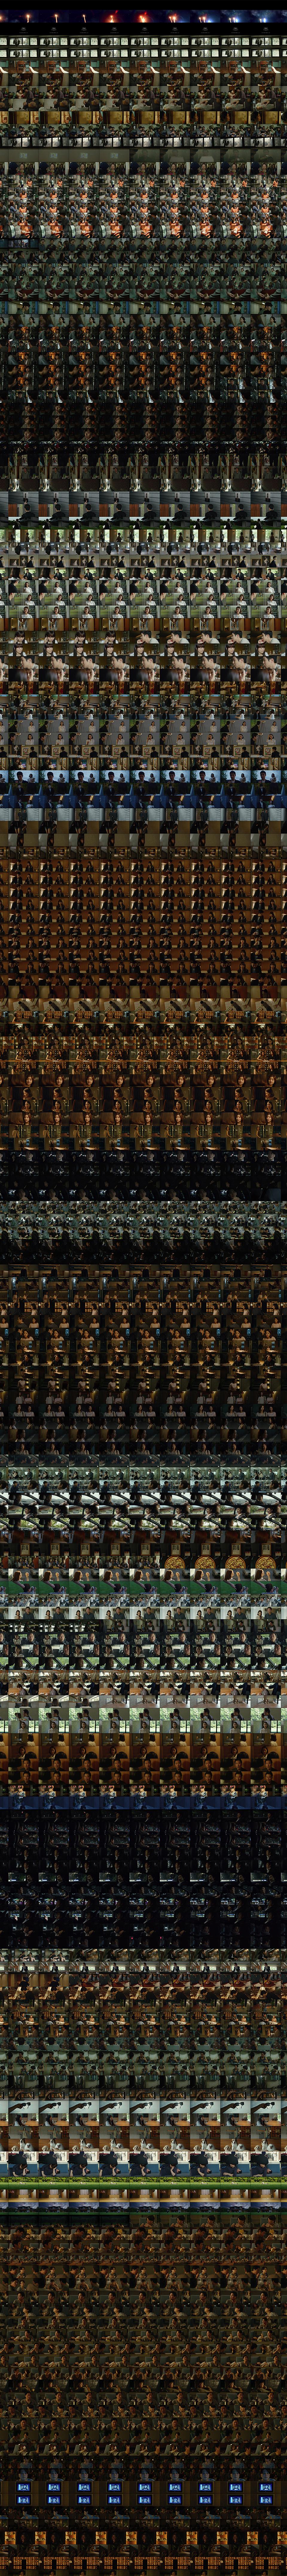 20200615_UNFOLD_PARASITE_2020_2h12m_15fps_348x341Frames_118668Photos_2547x1476mm_299ppi_CenterTop.jpg